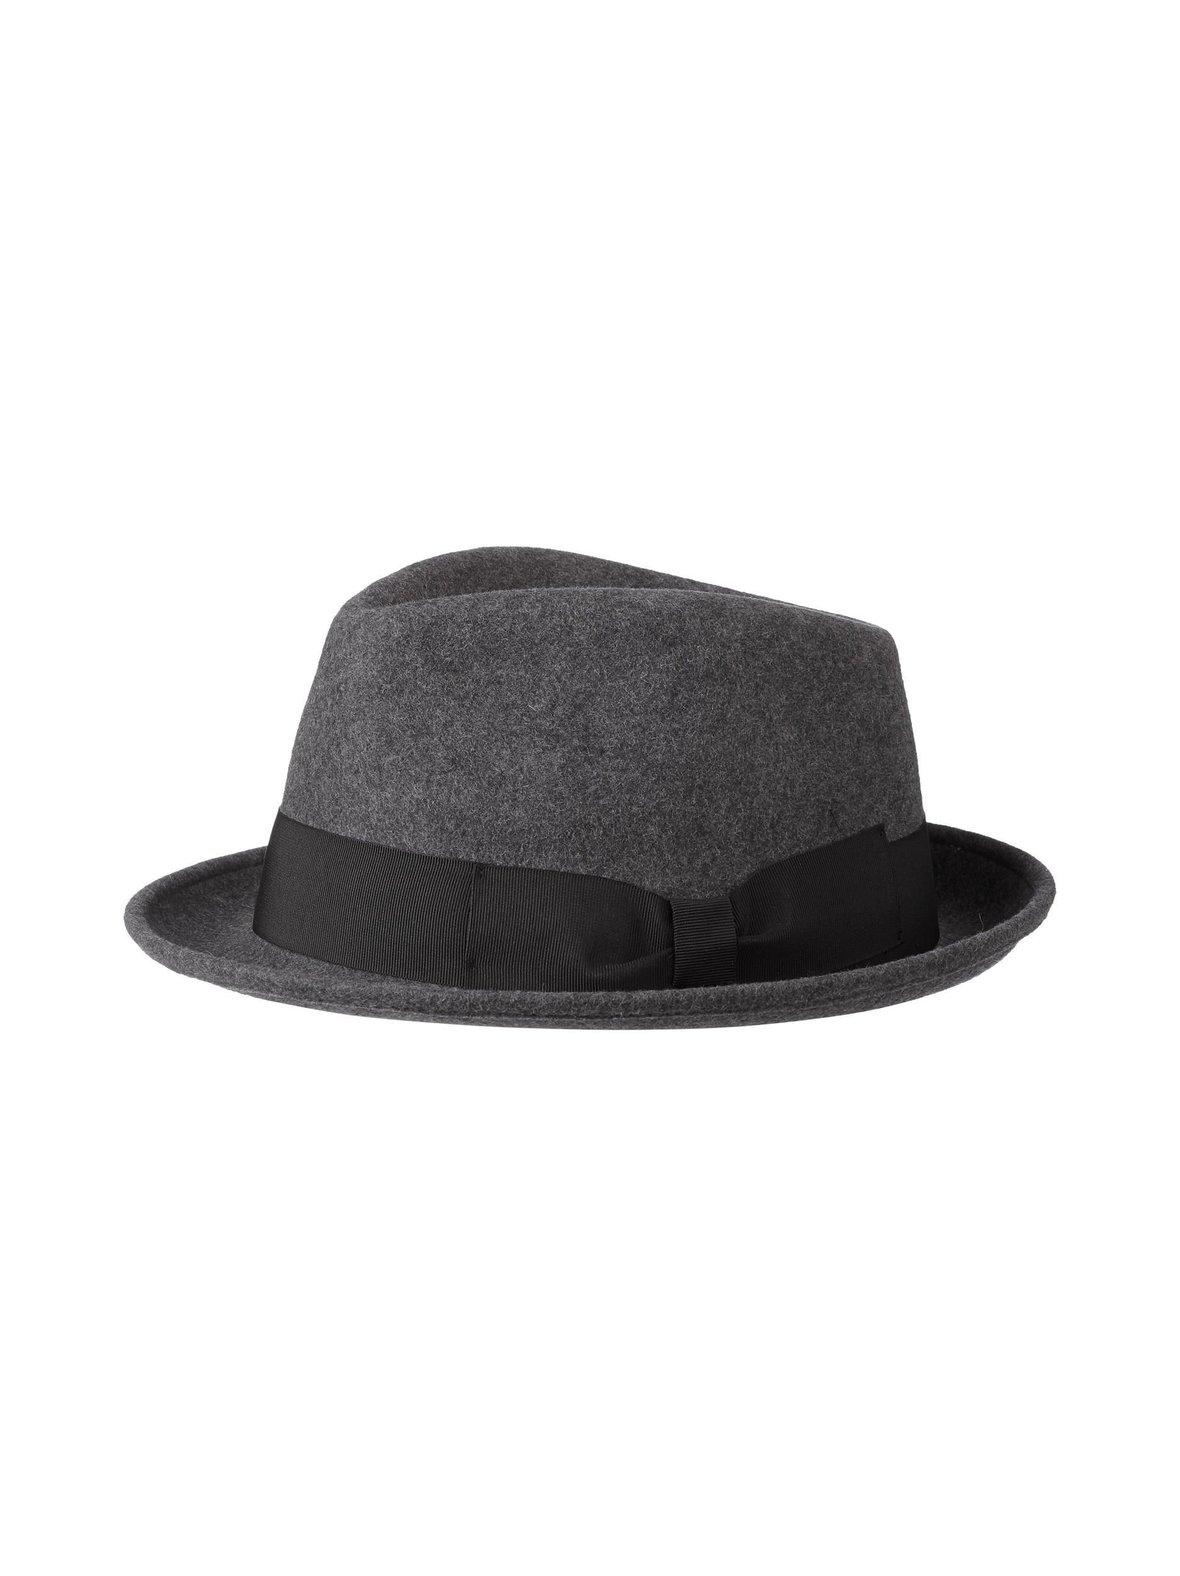 Grey (harmaa) KN Collection Claus-hattu CLAUS  3ac6a8fa11